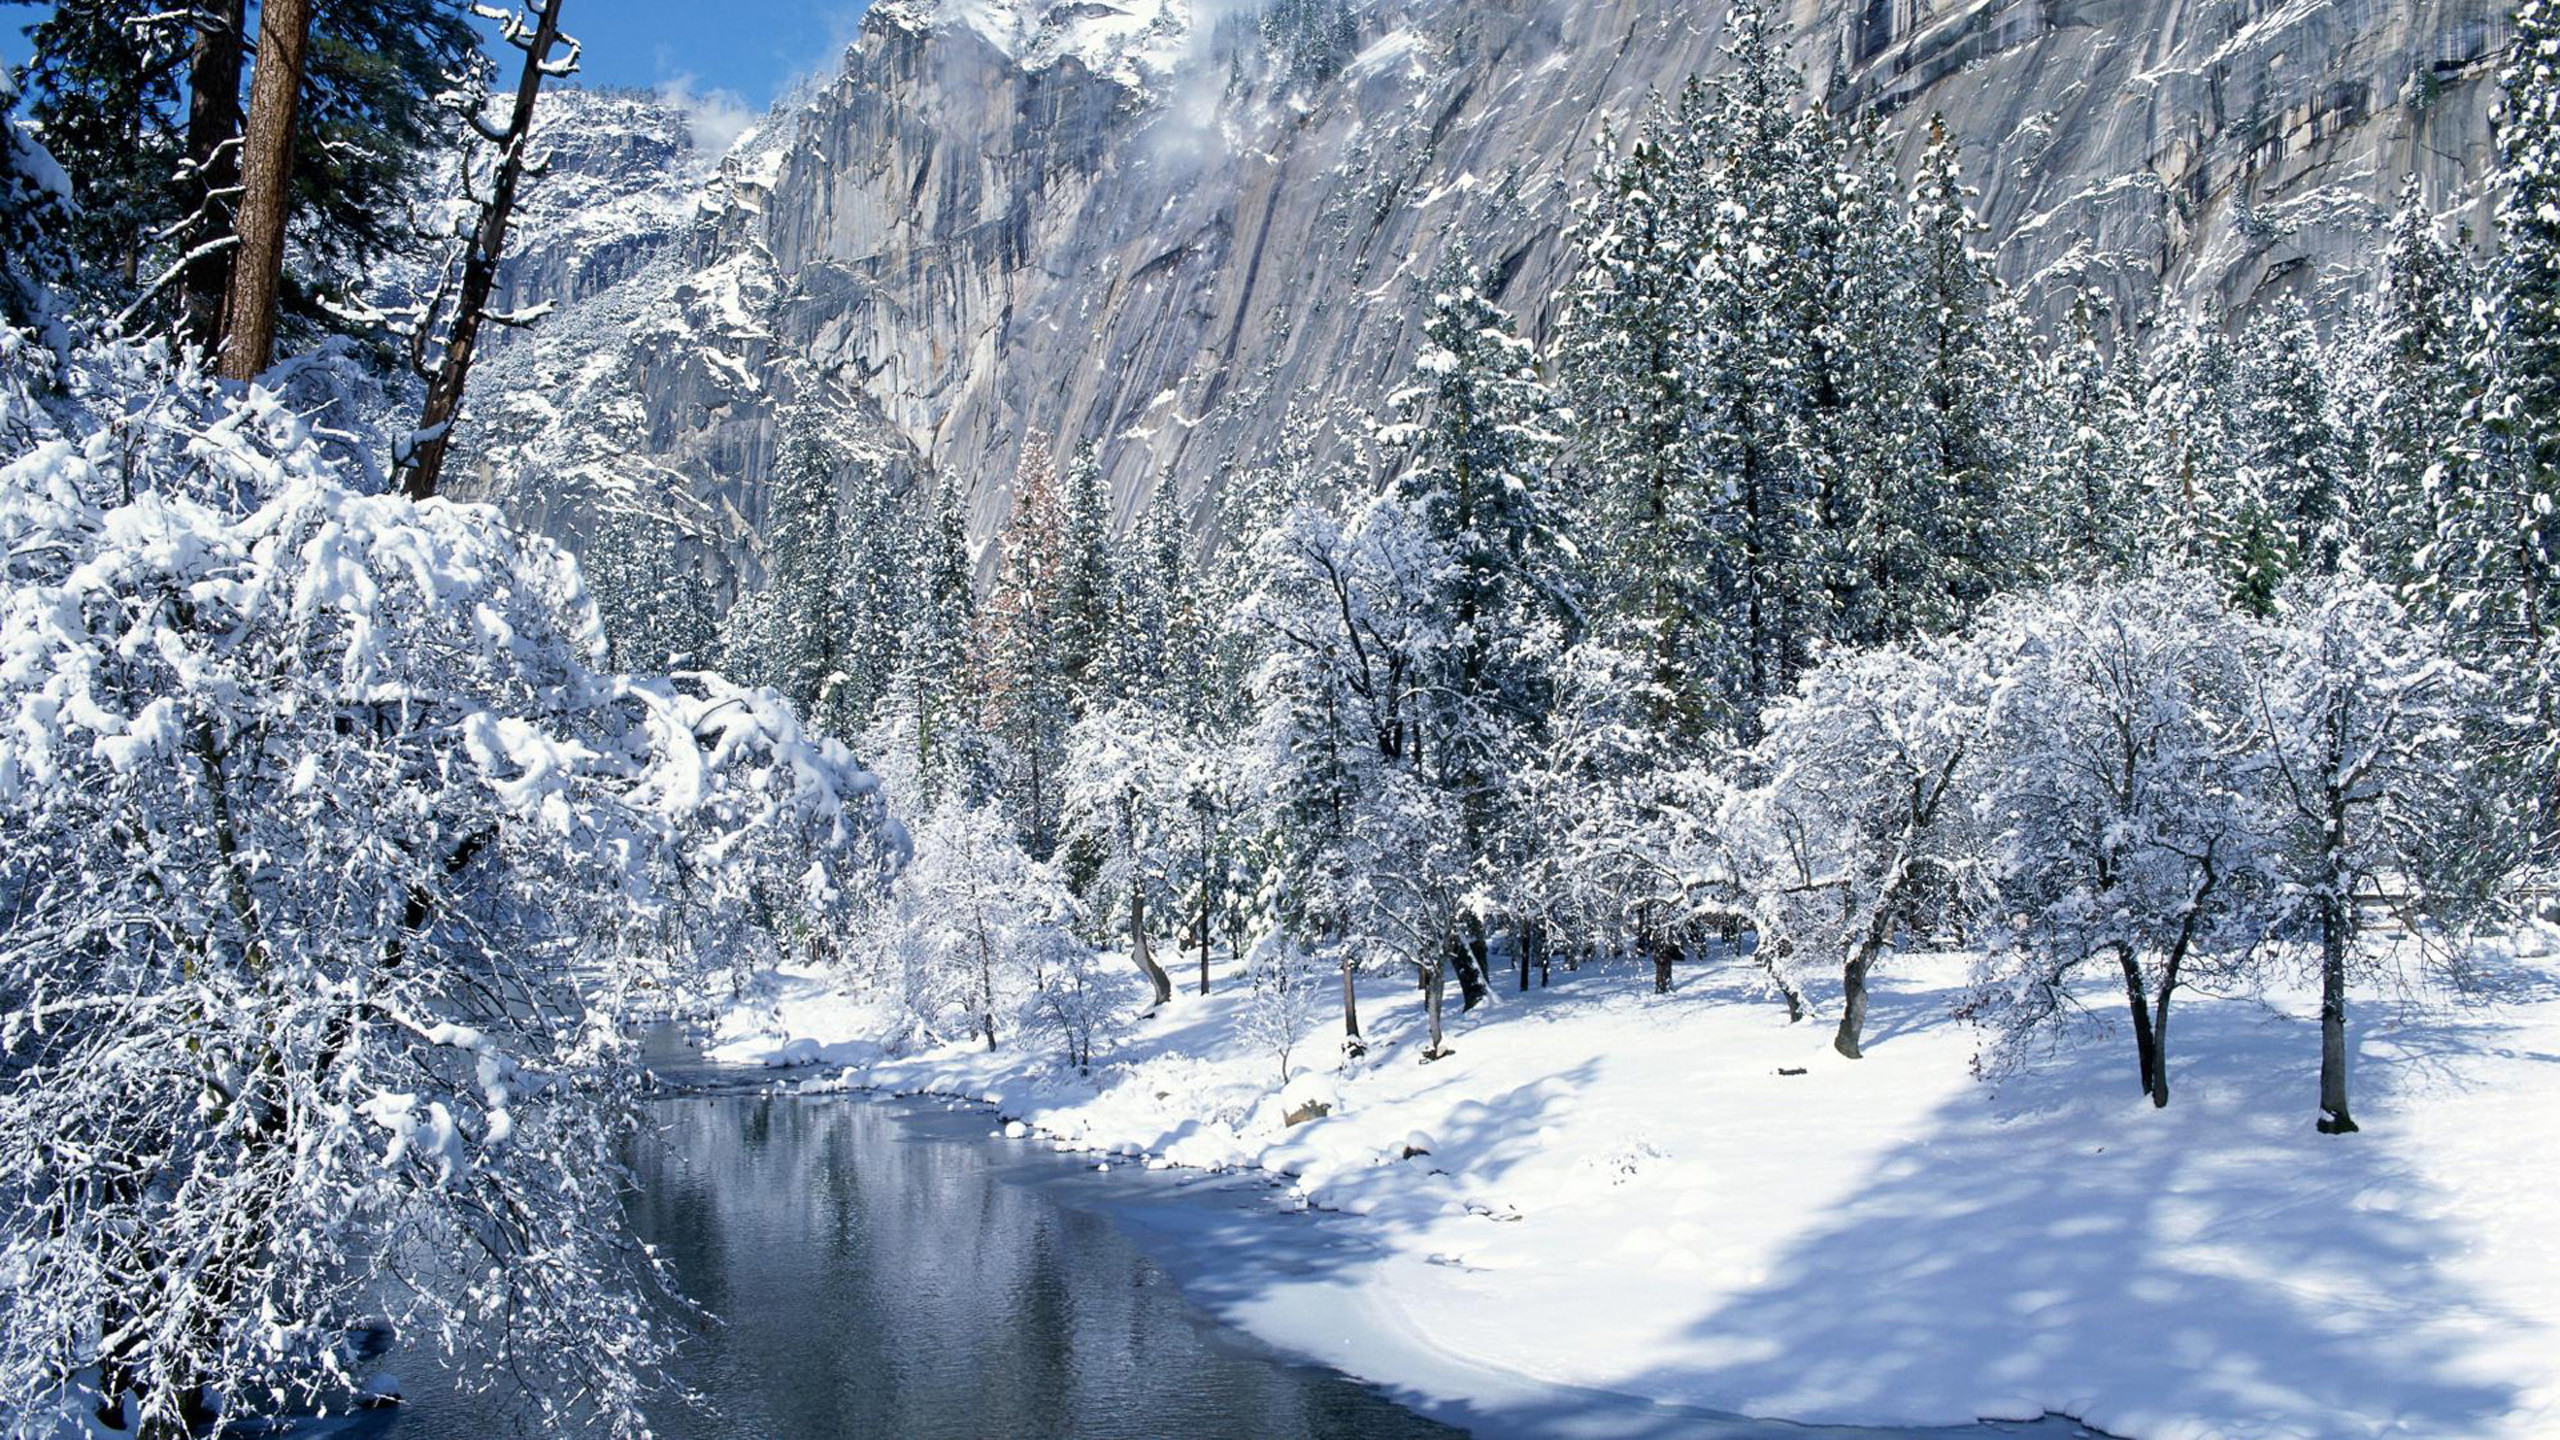 Winter Snow Scenes Wallpaper ·① WallpaperTag